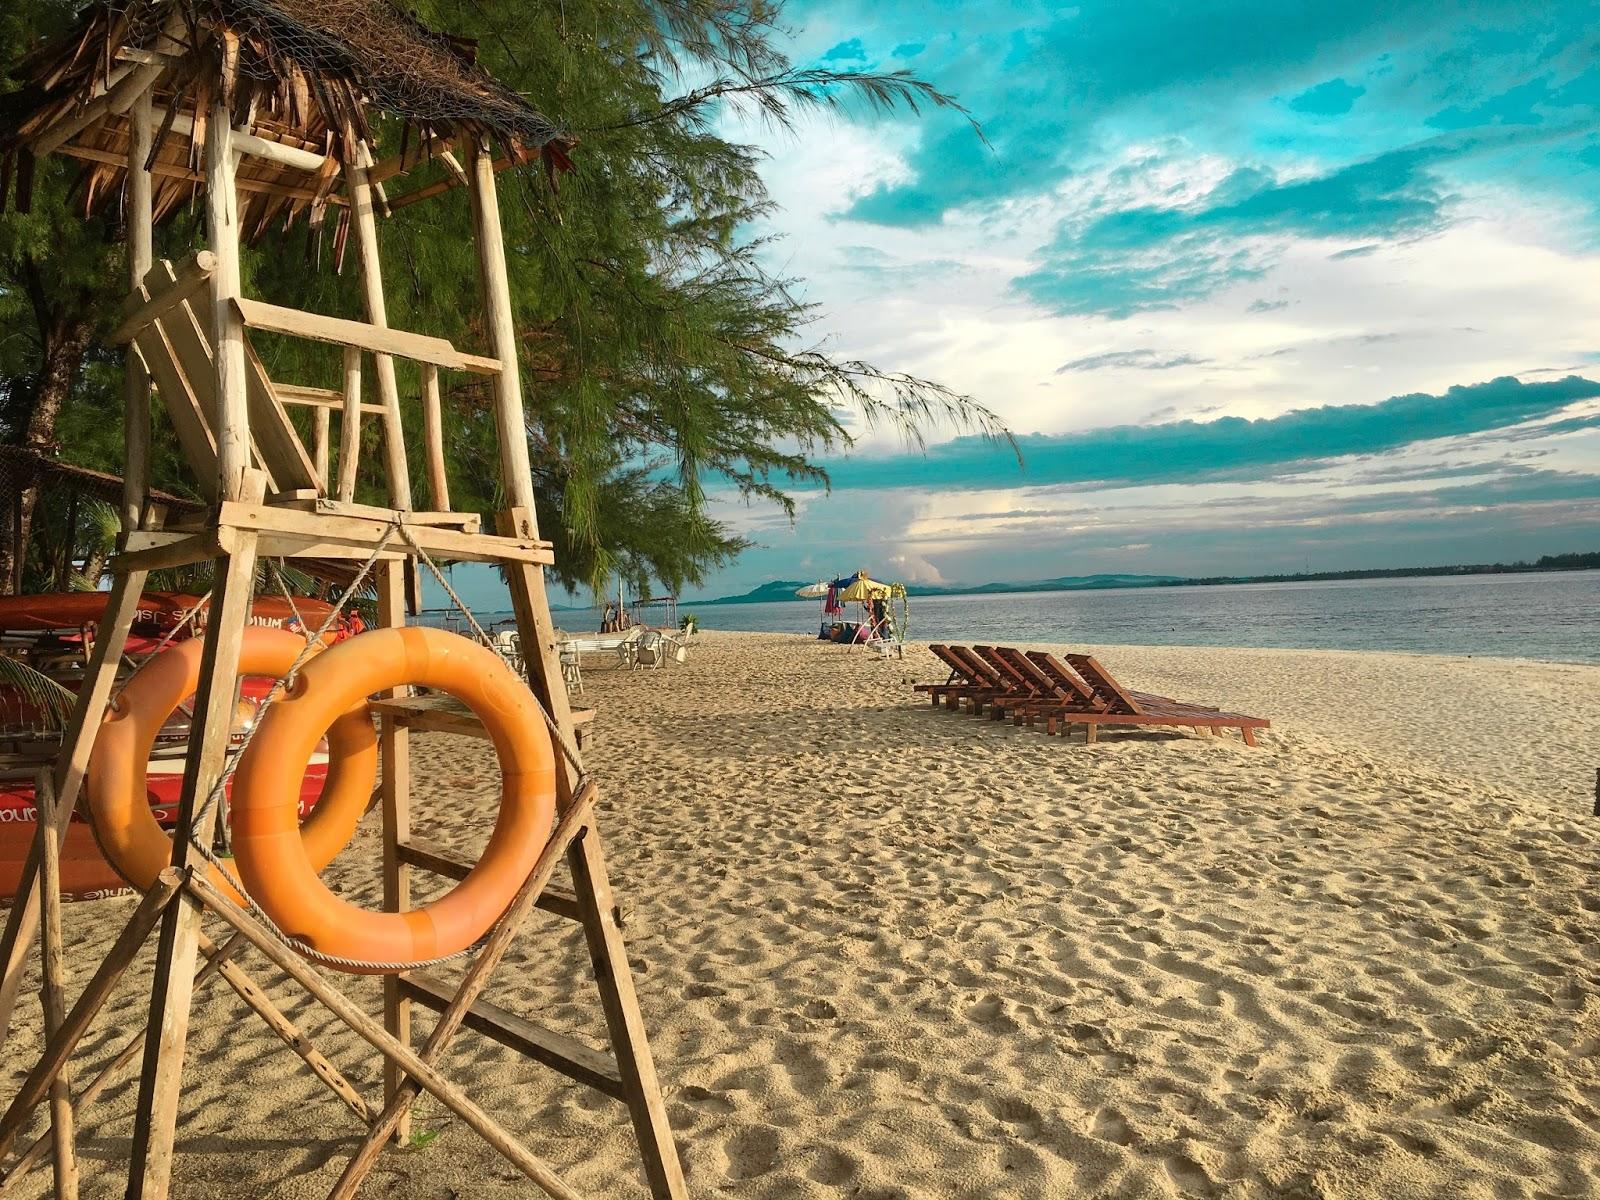 Terpikat Pasir Putih White Sands Island Pulau Beralas Pasir Bintan - livejournalofasad.com